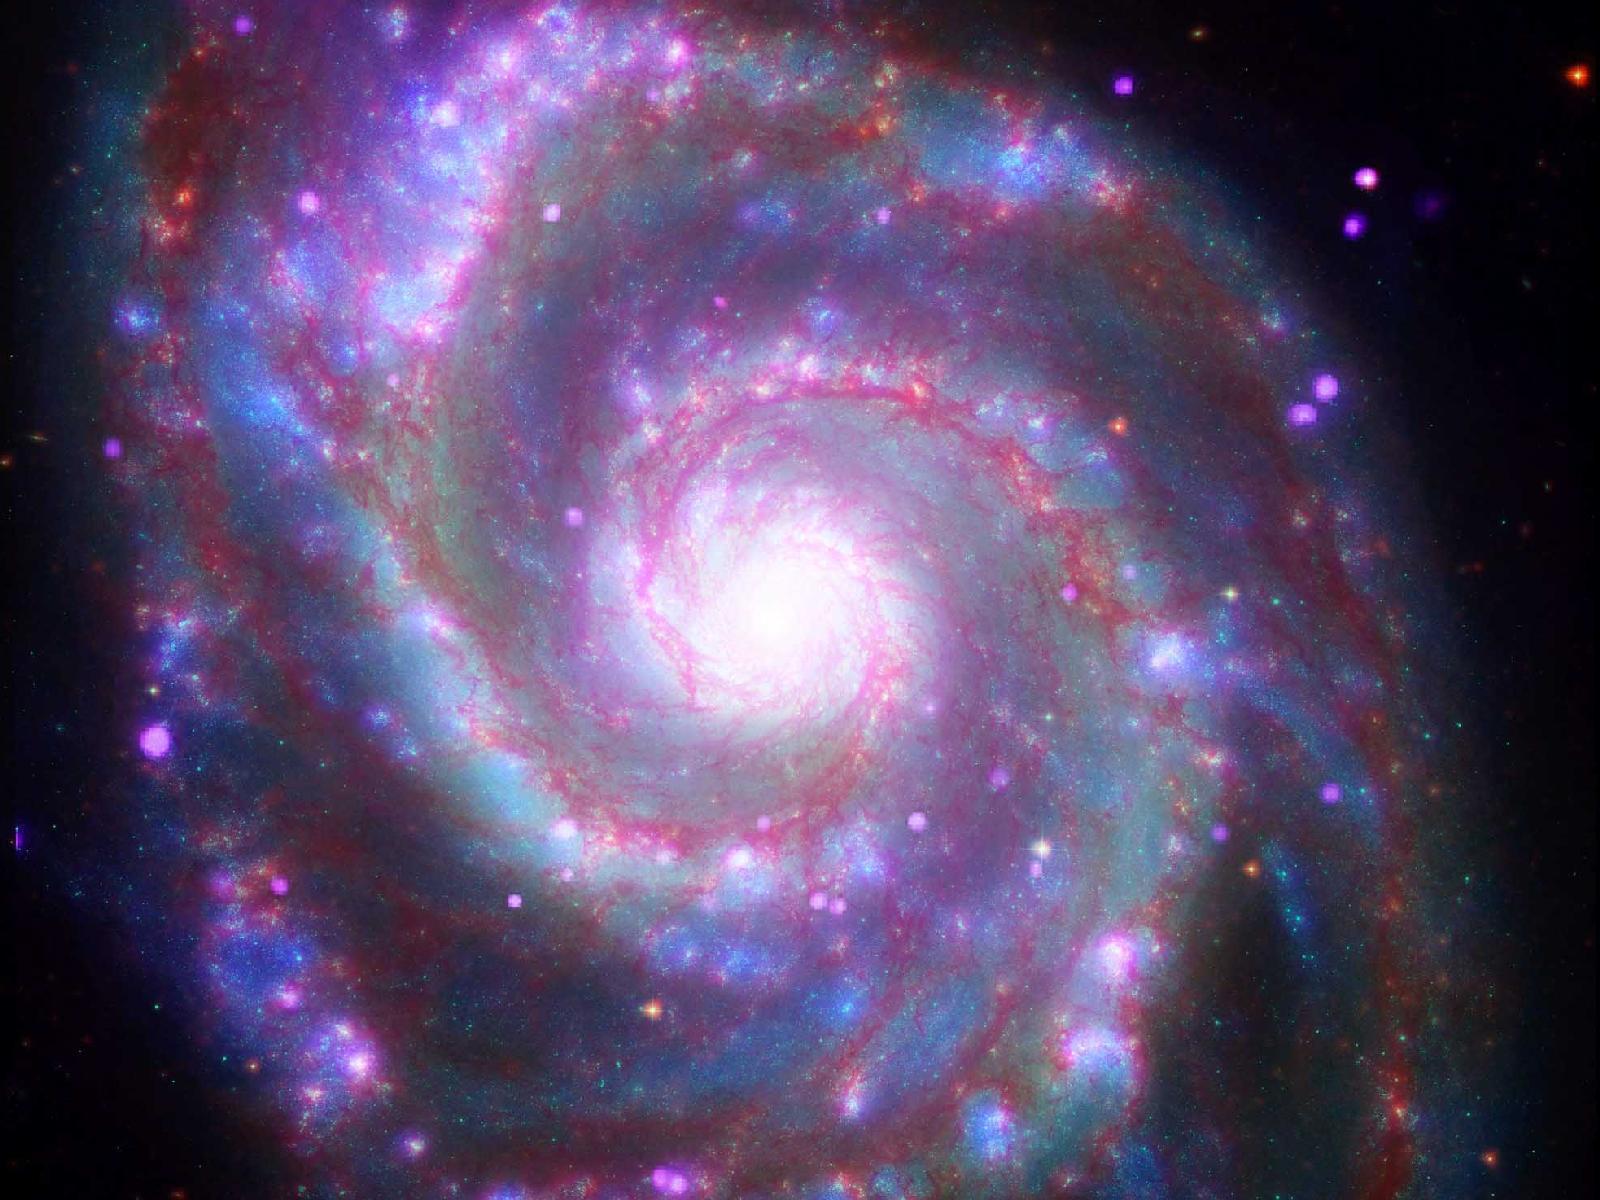 http://1.bp.blogspot.com/-bhXKJywpsnk/TzxcKyJBjoI/AAAAAAAAAqA/BrMpVFf29R0/s1600/spiral-galaxy-wallpaper.jpg